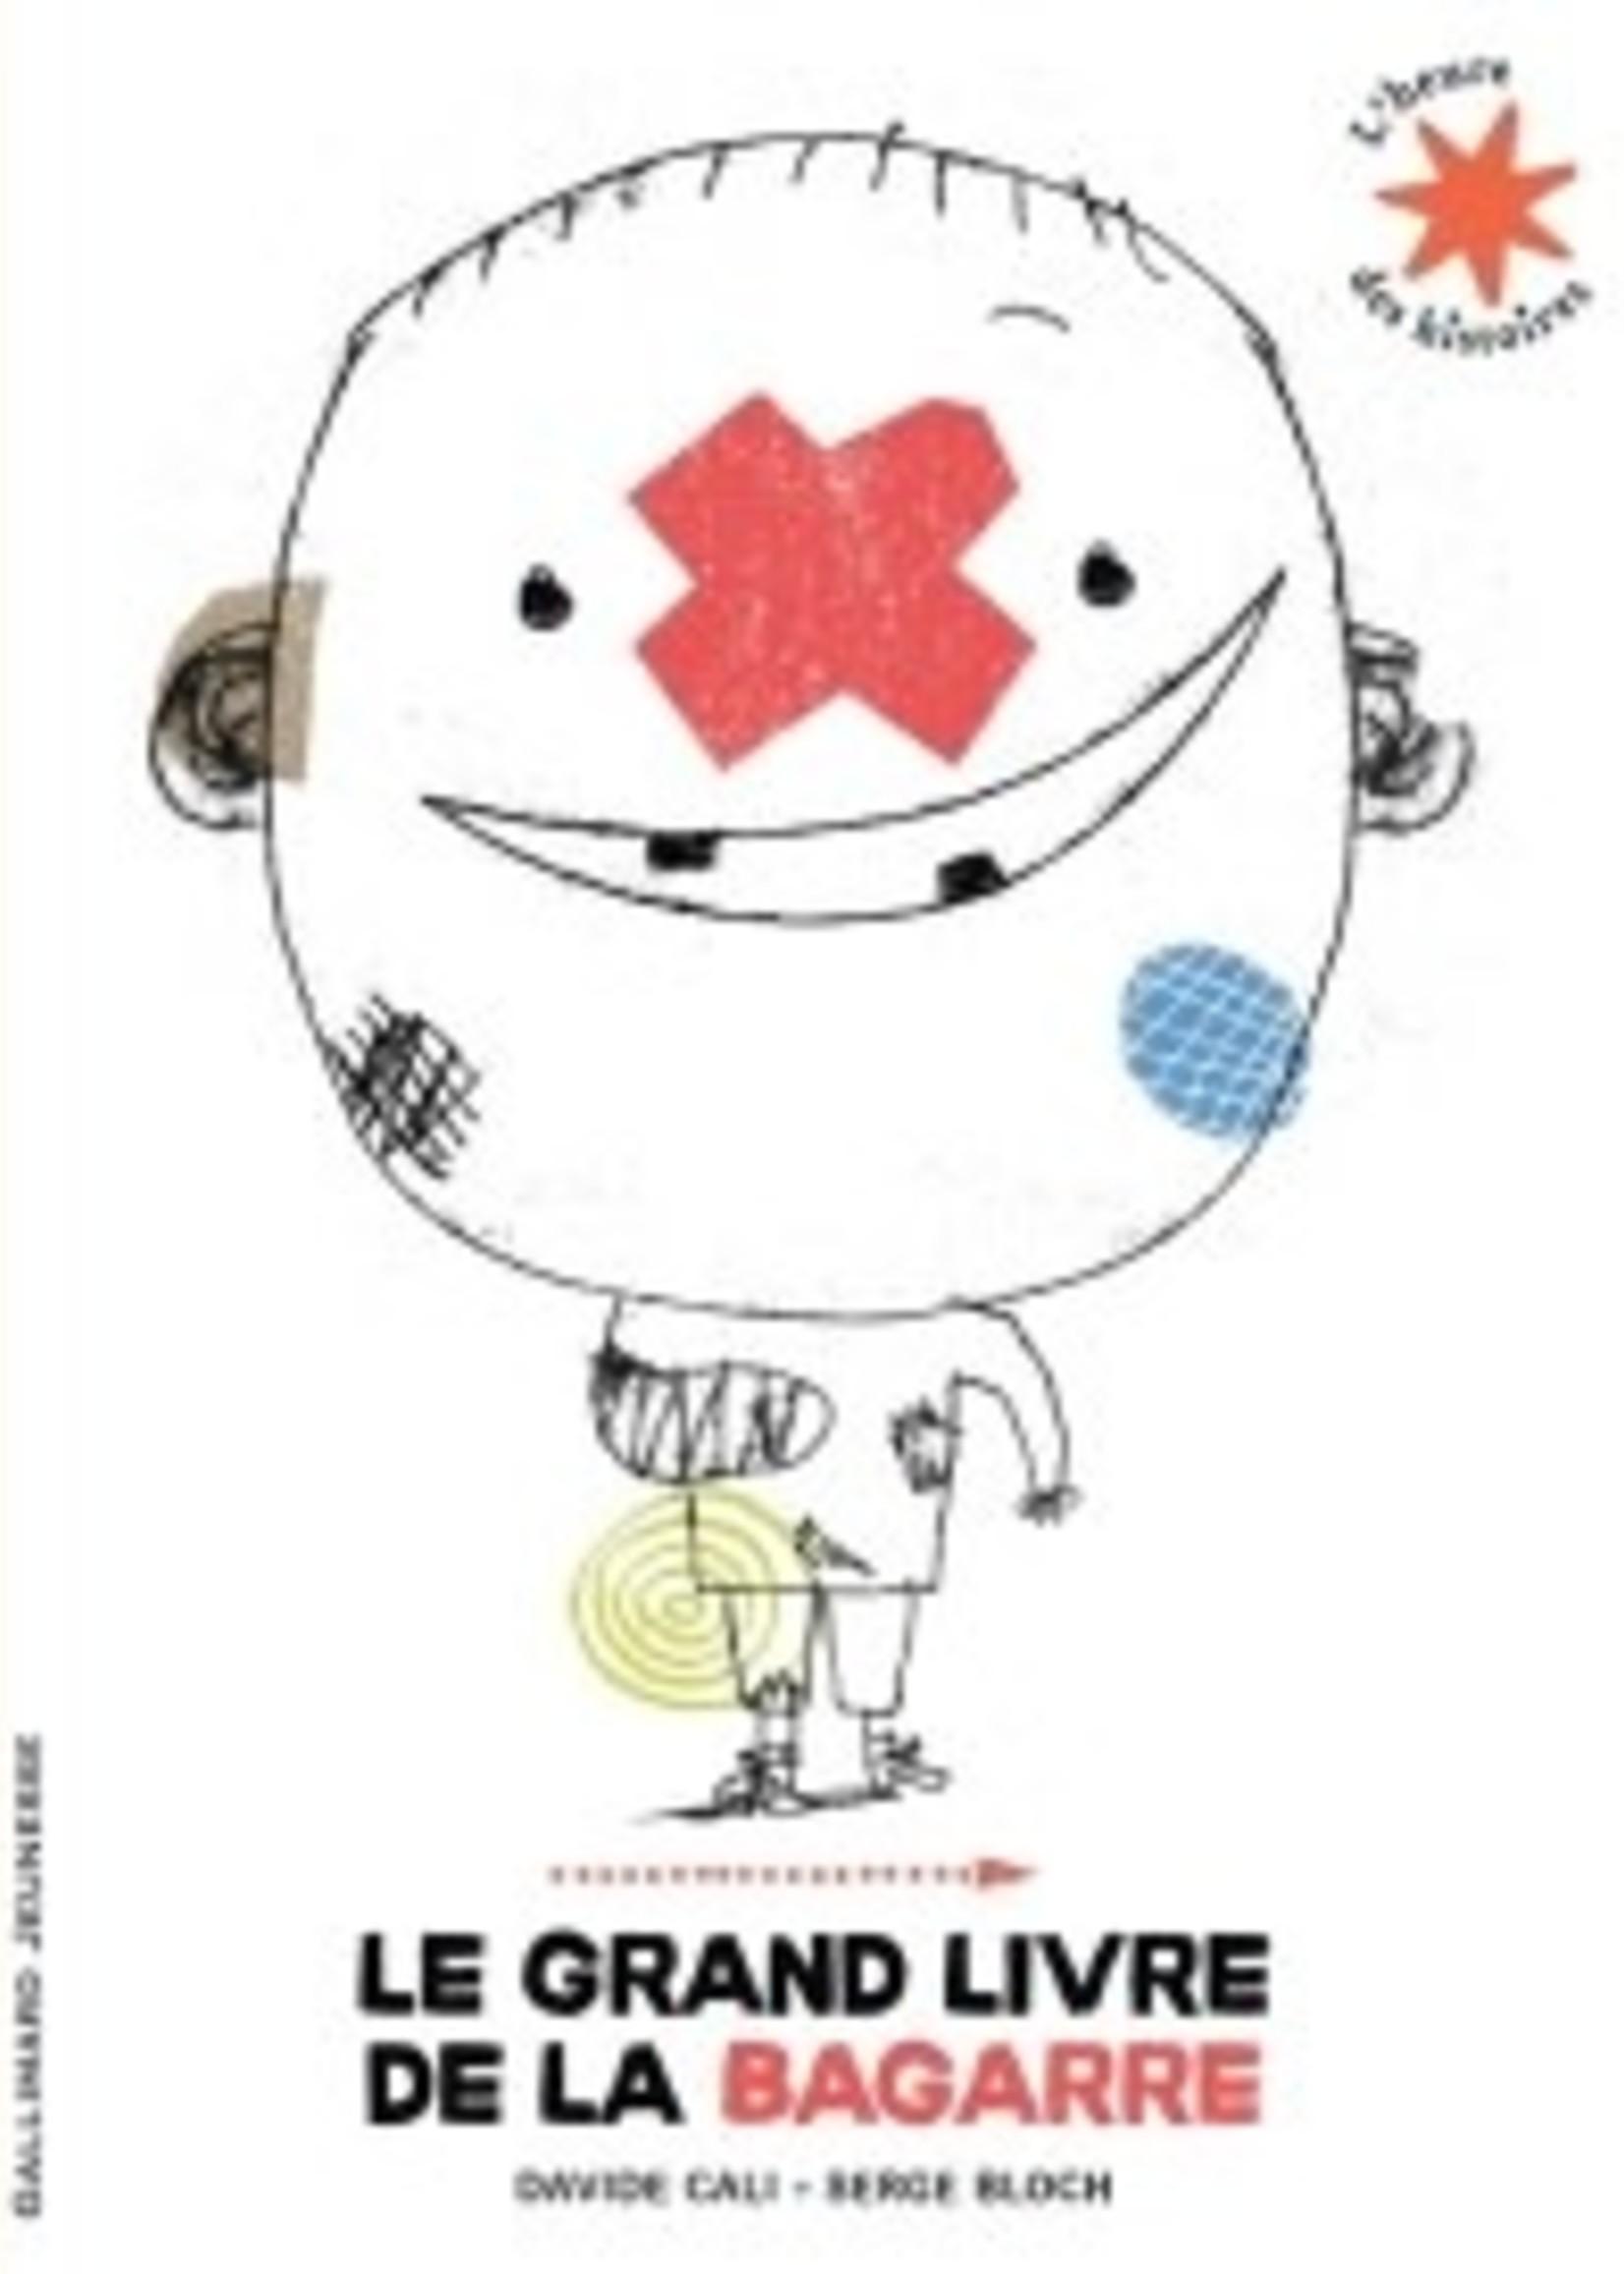 Le grand livre de la bagarre by David Cali, Serge Bloch